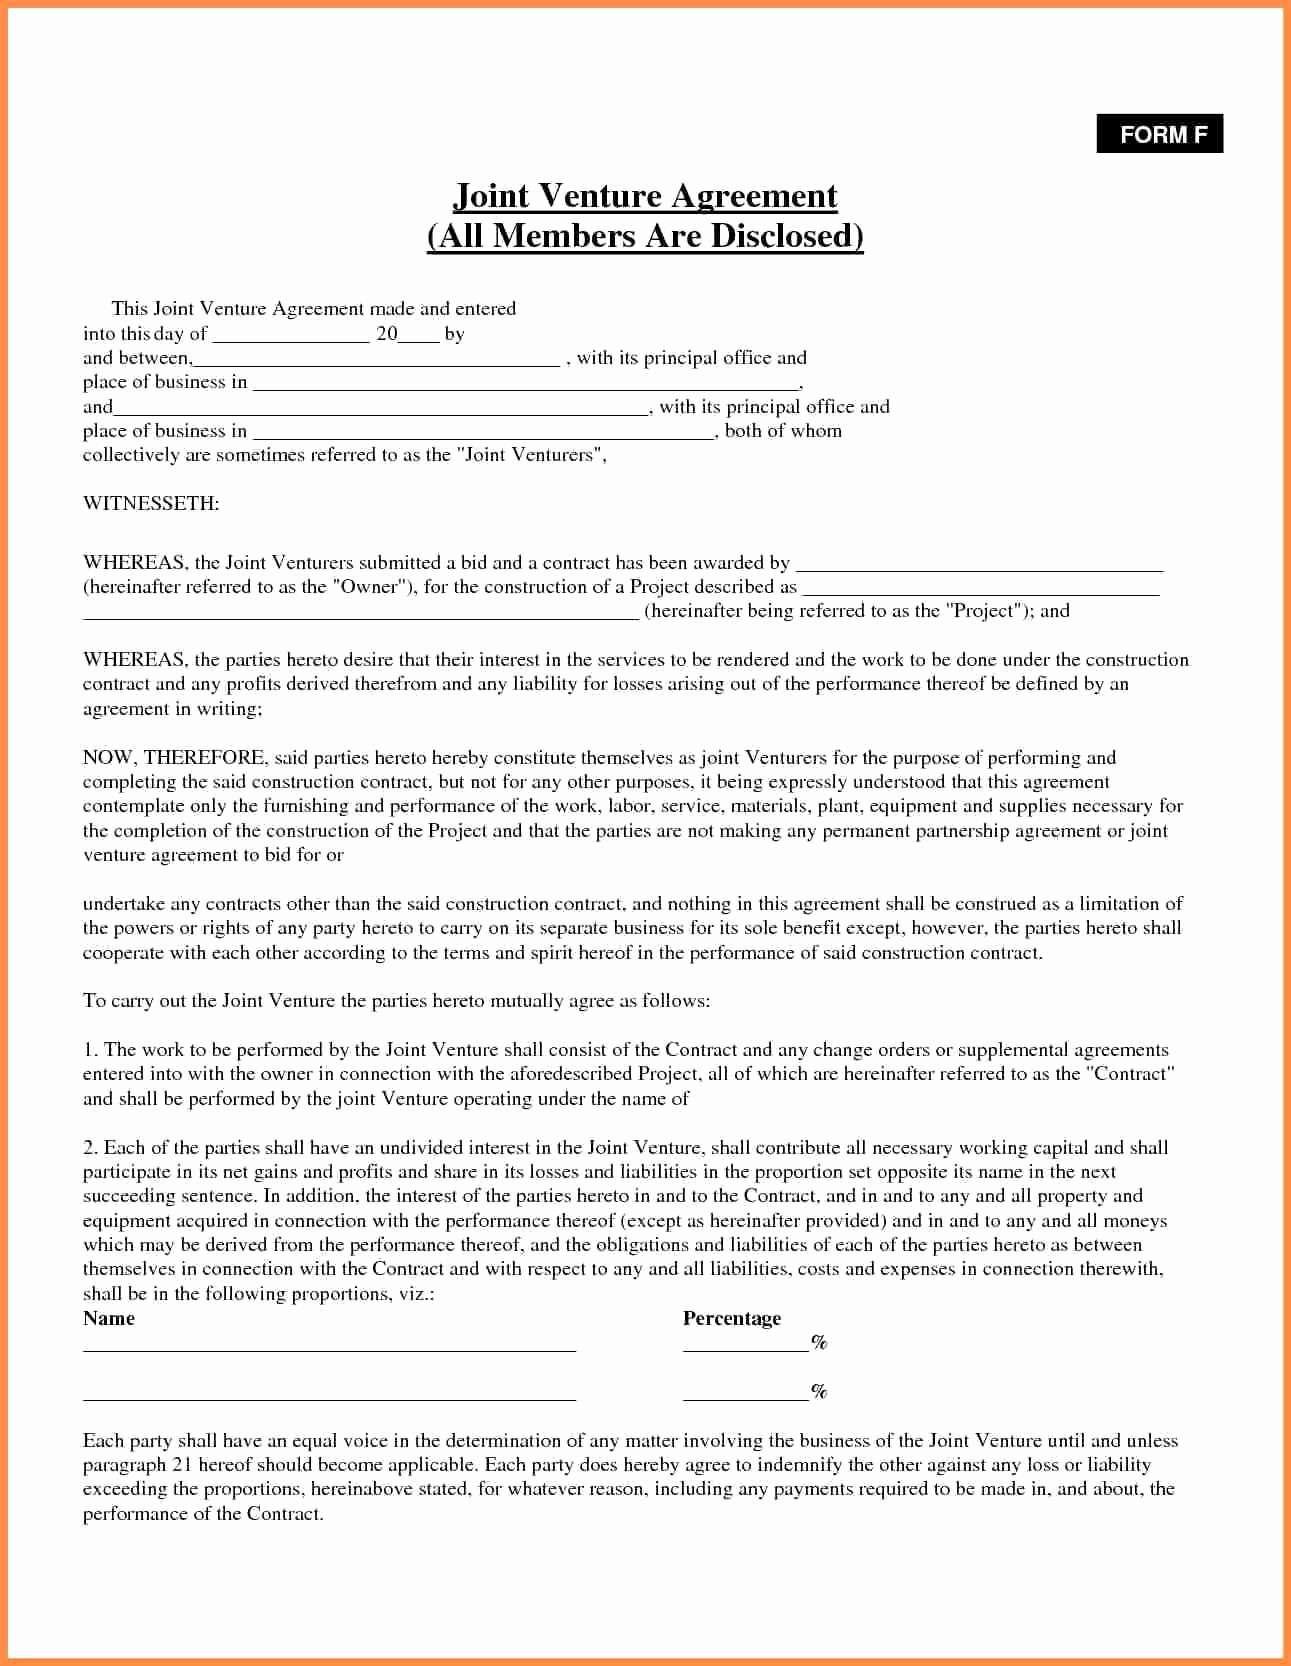 Business Associate Agreement Hipaa Template  Caquetapositivo Intended For Supplemental Agreement Template